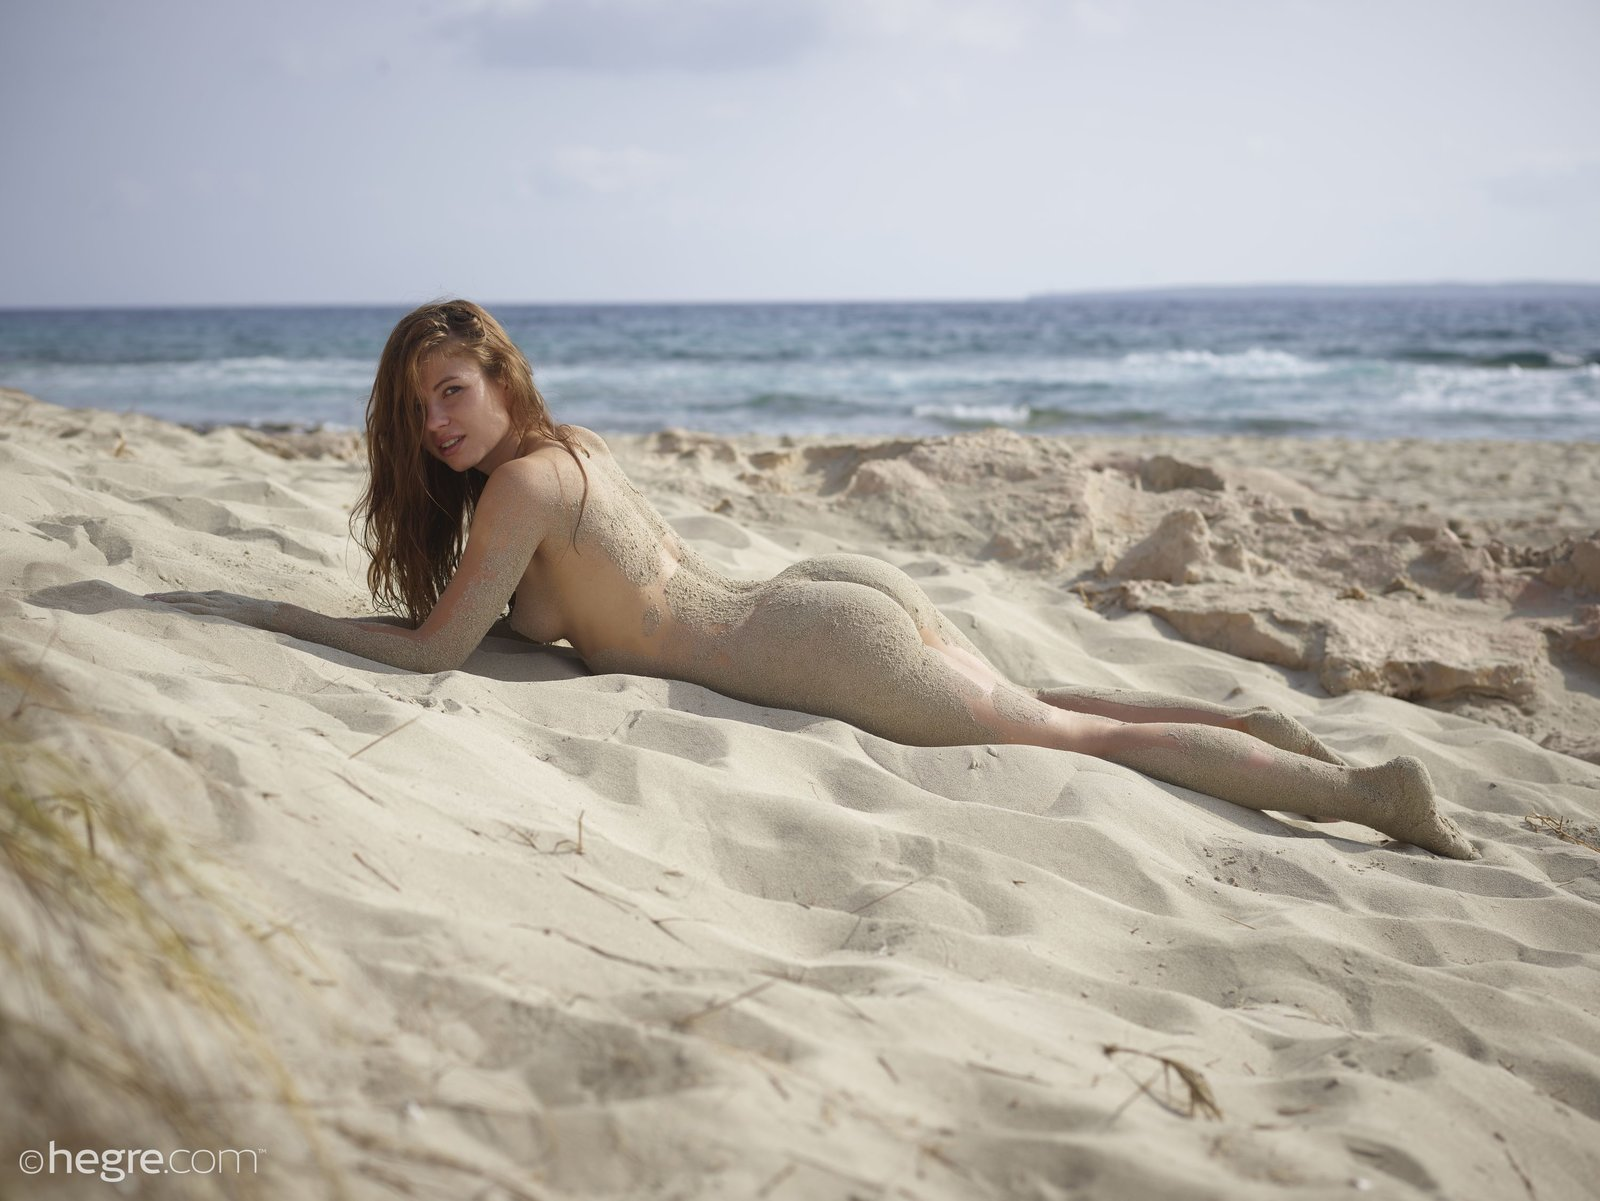 jenna in beach nudes by hegre art photos erotic